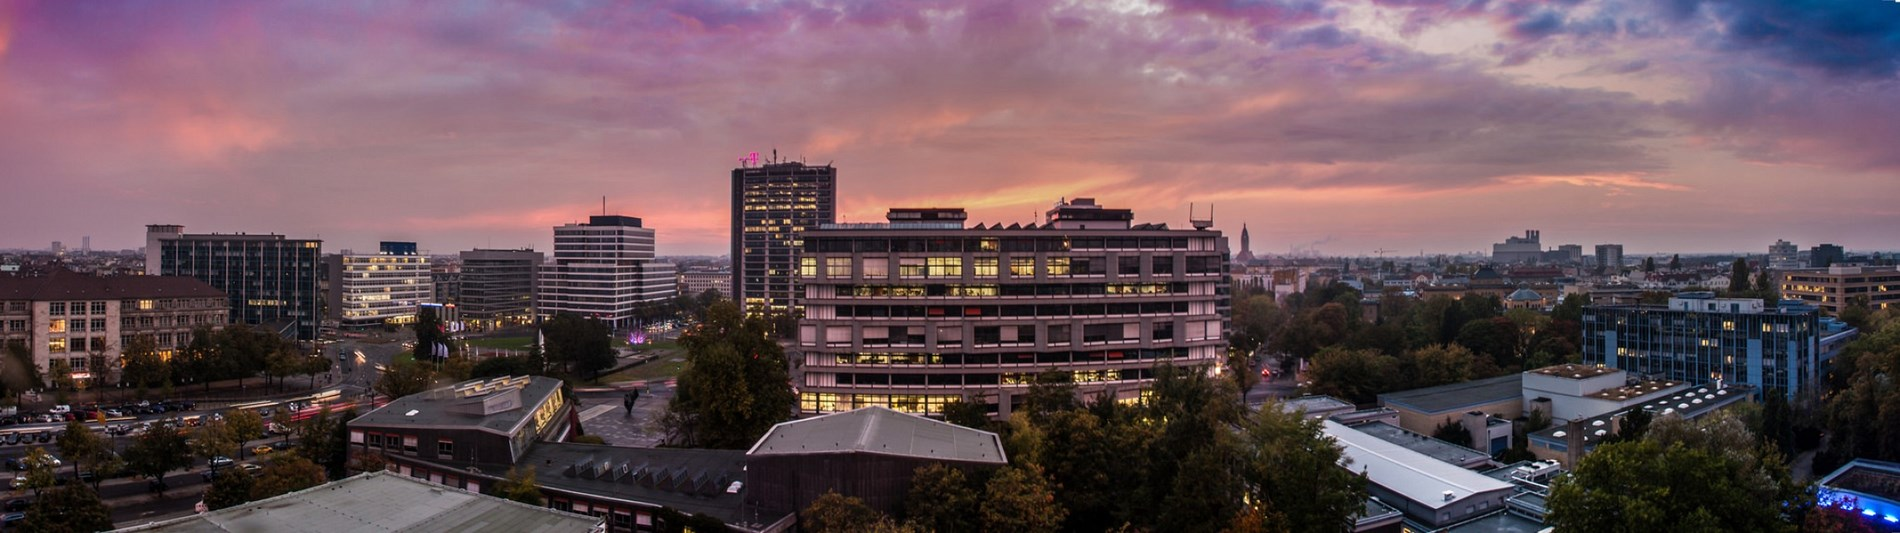 Technical University of Berlin-Photos-2